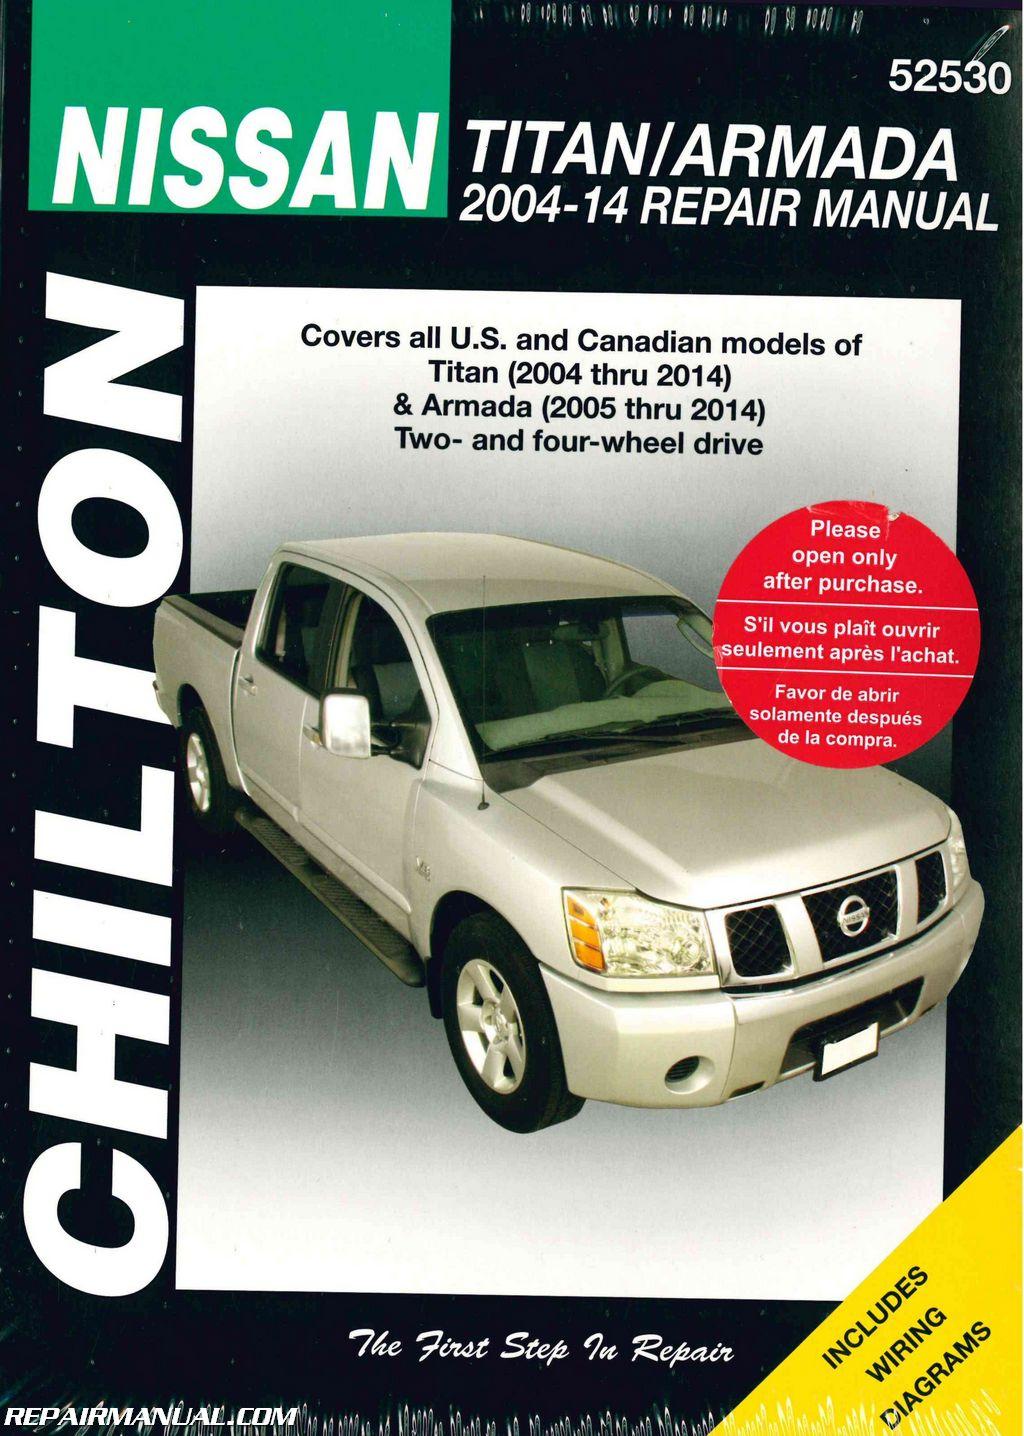 chilton 2004 2014 nissan titan 2005 2014 nissan armada truck repair rh repairmanual com 2007 nissan armada owner's manual pdf 2010 nissan titan owners manual